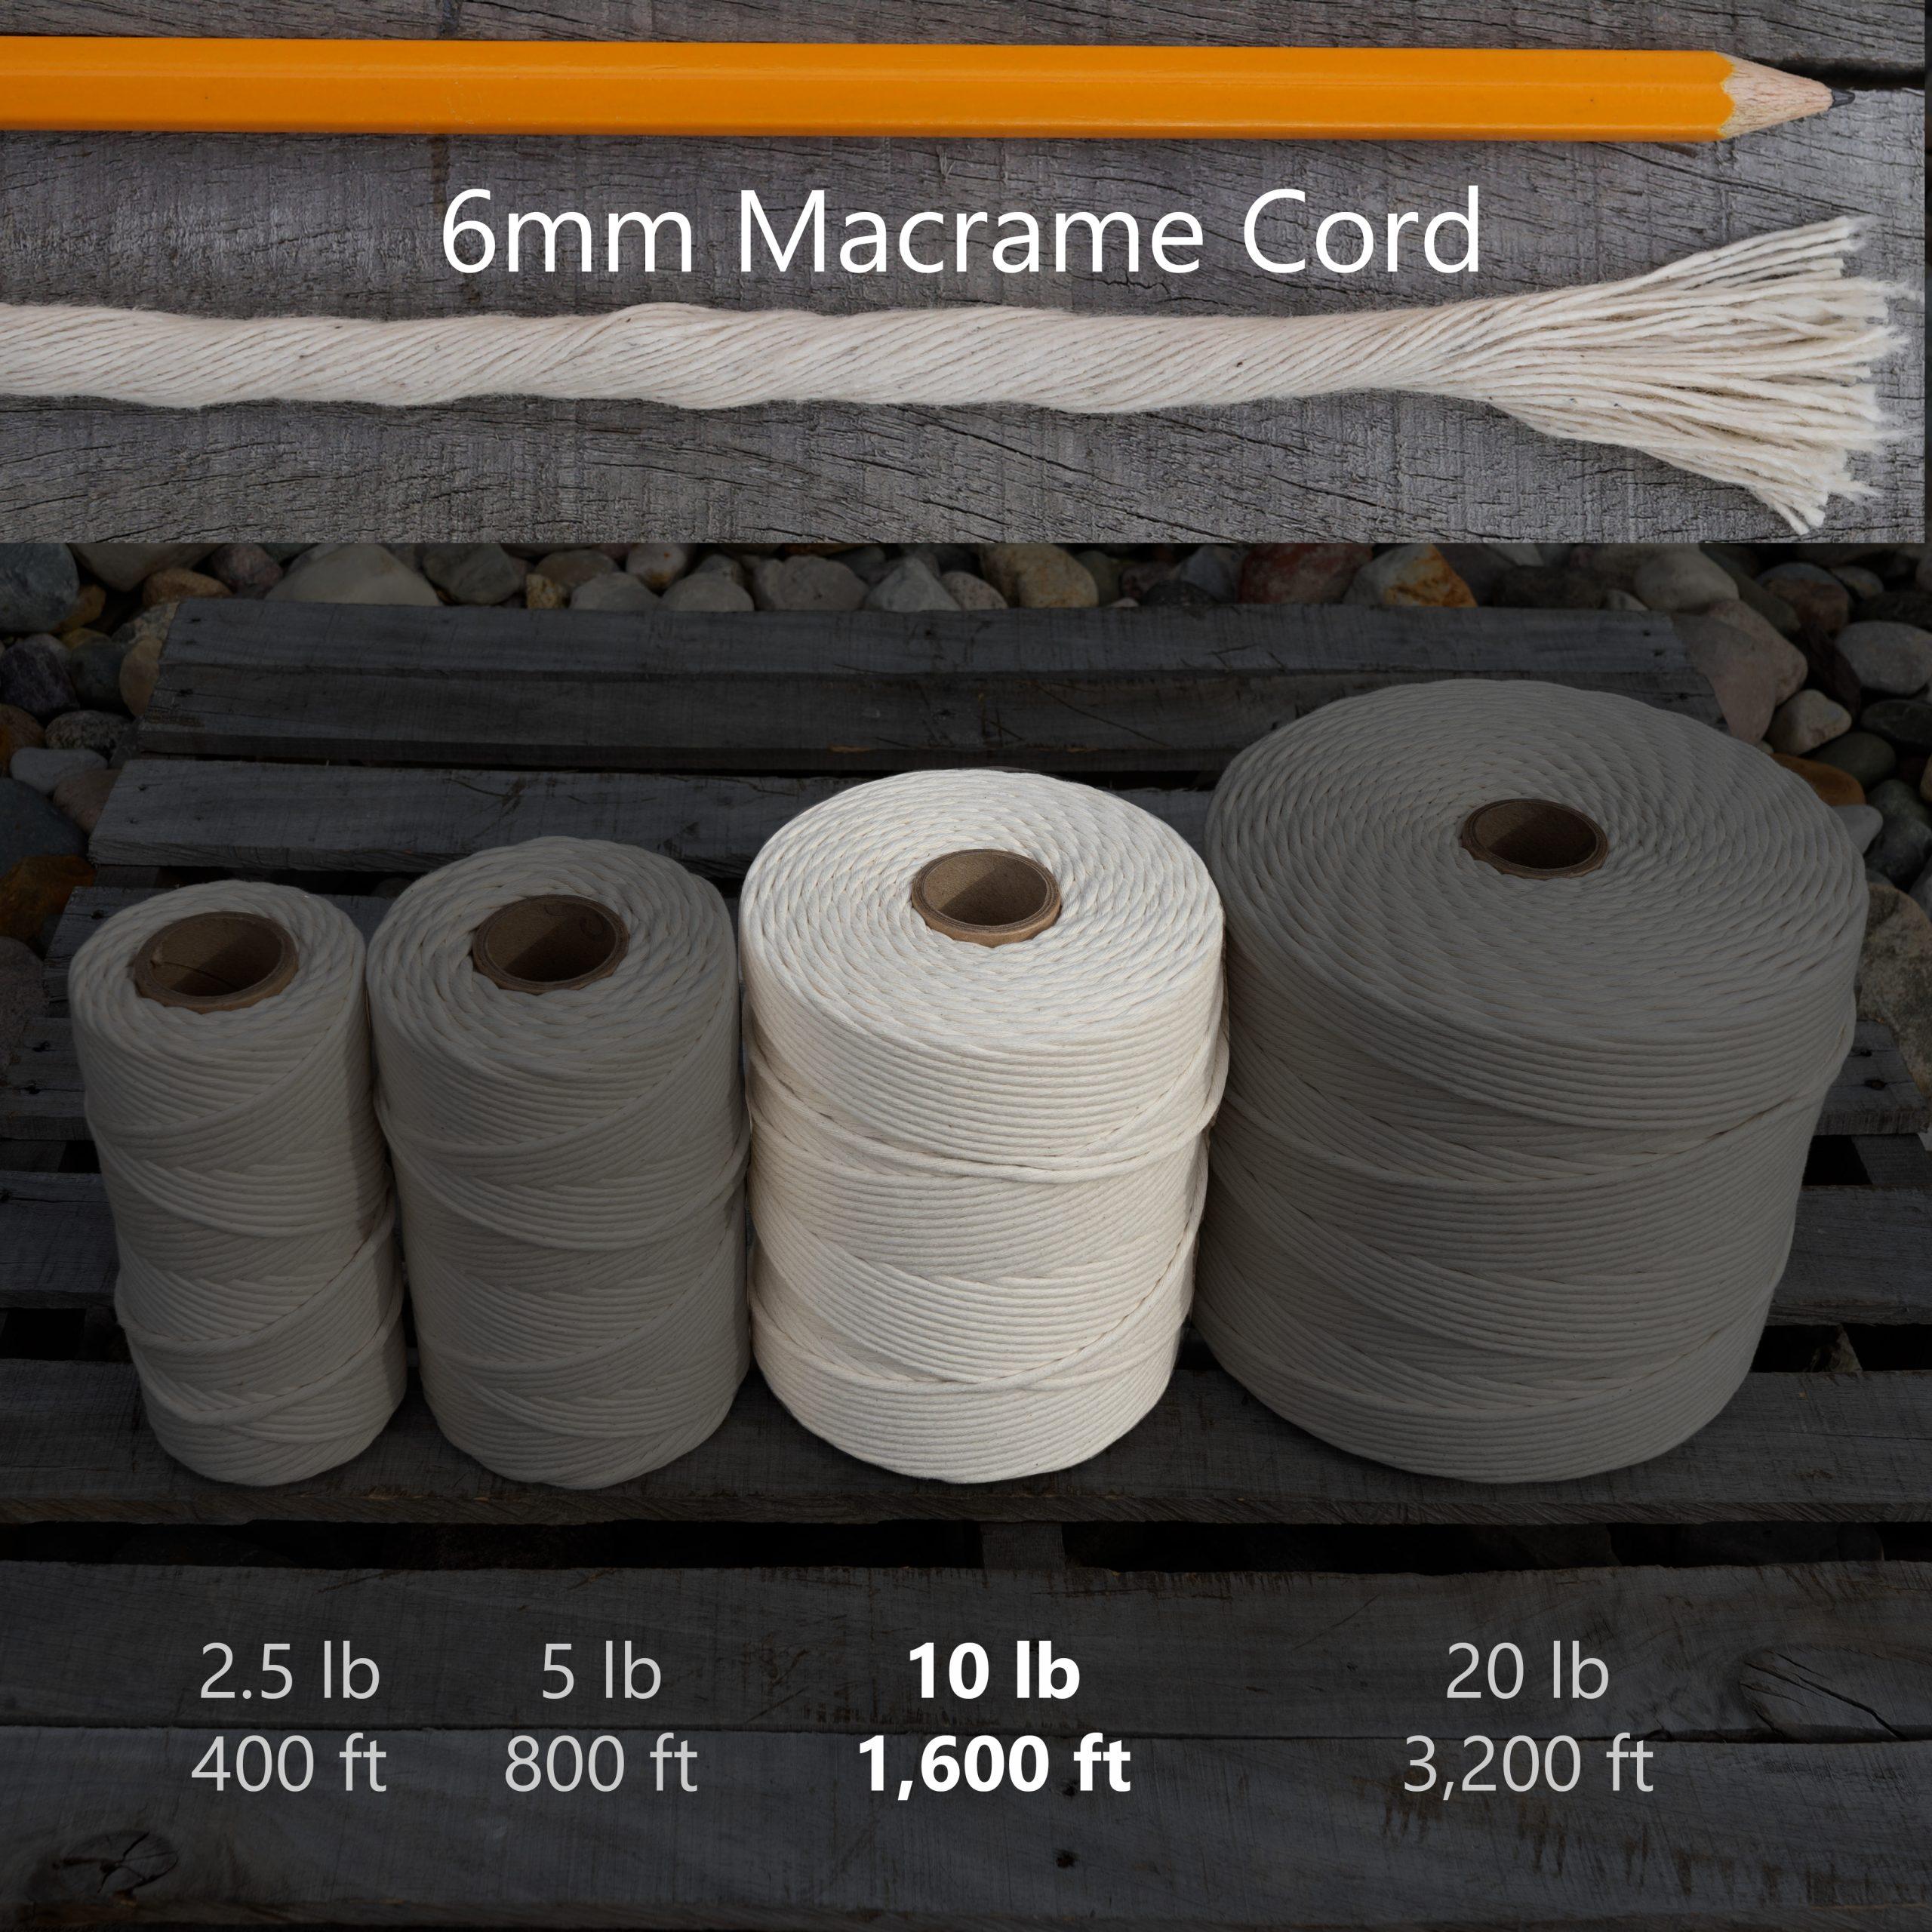 6 mm x 10 lb macrame tube